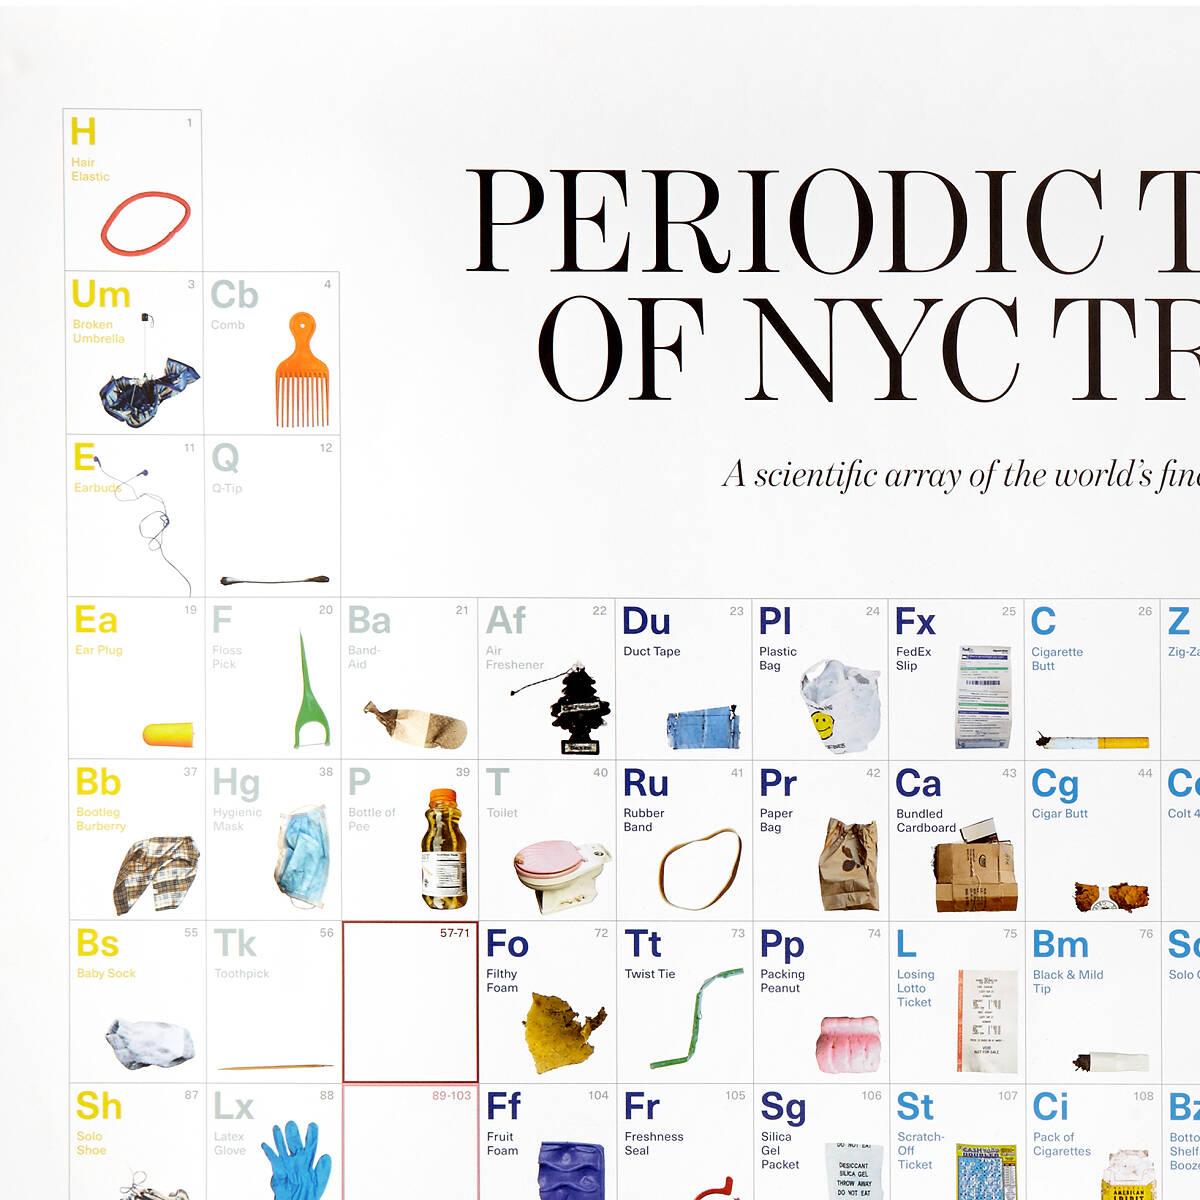 Periodic table of nyc trash garbage infographic uncommongoods periodic table of nyc trash 2 thumbnail gamestrikefo Images